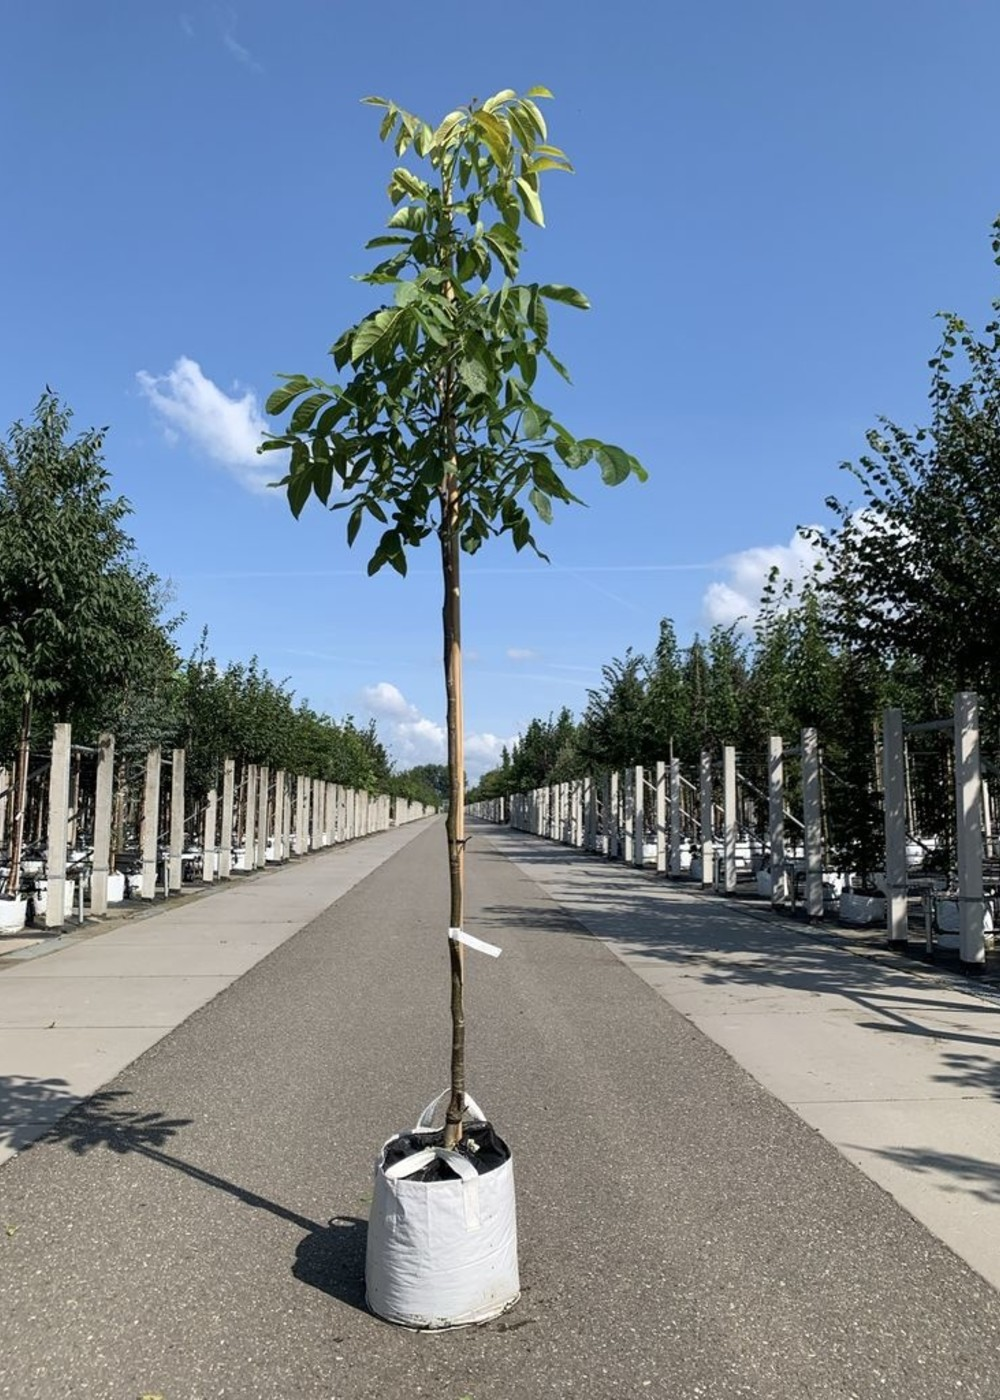 Walnussbaum Plovdivski | Juglans regia Plovdiski